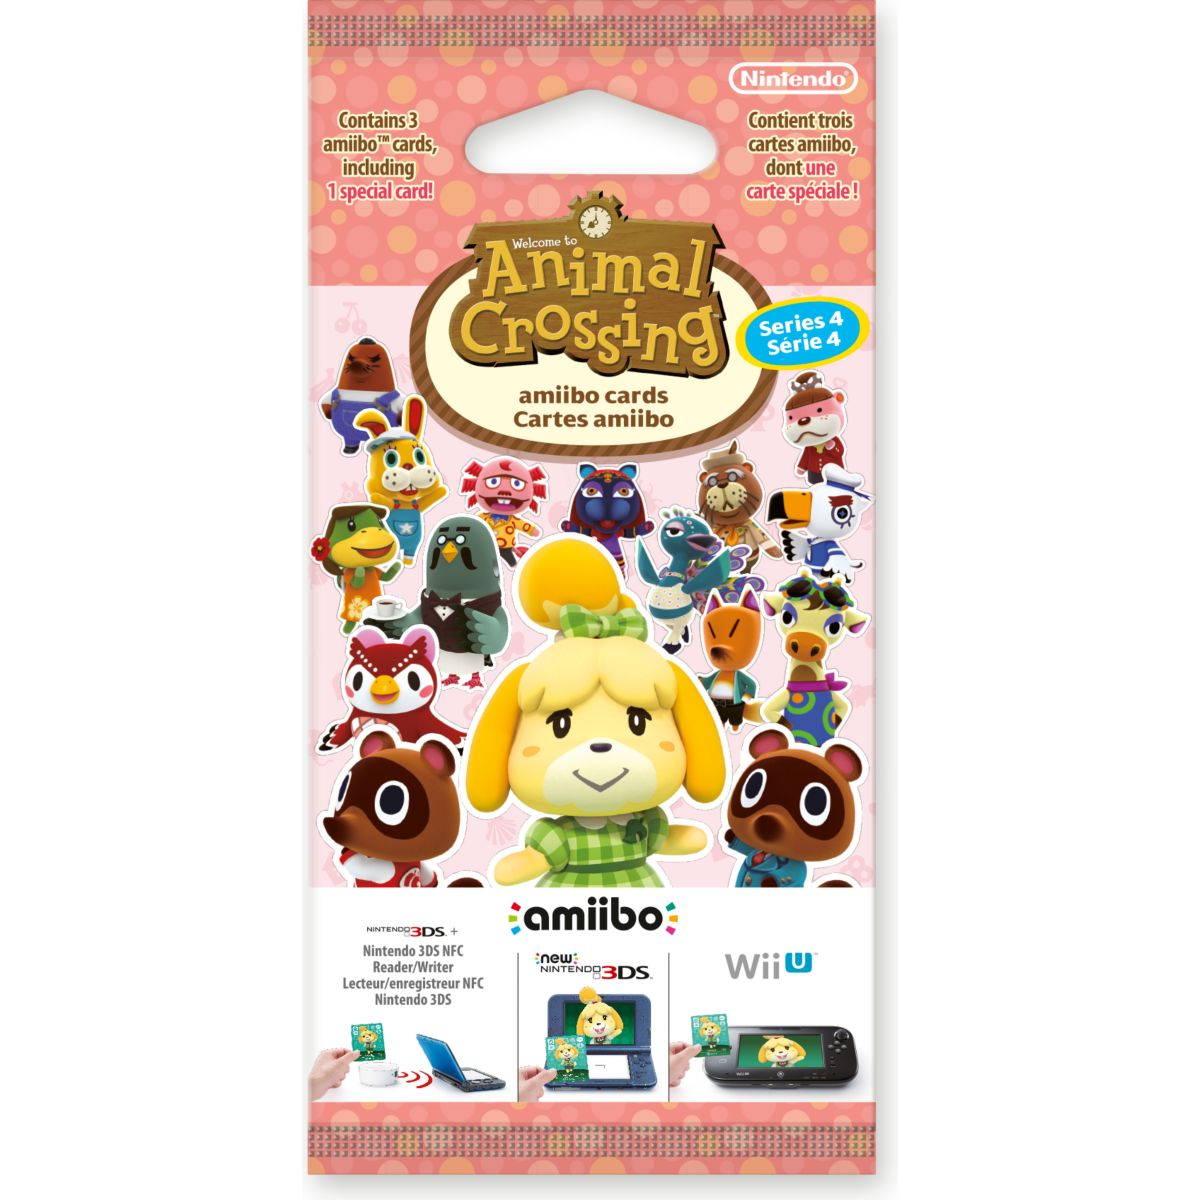 Pack cartes Amiibo NINTENDO 3 cartes Animal Crossing HDD Séri...